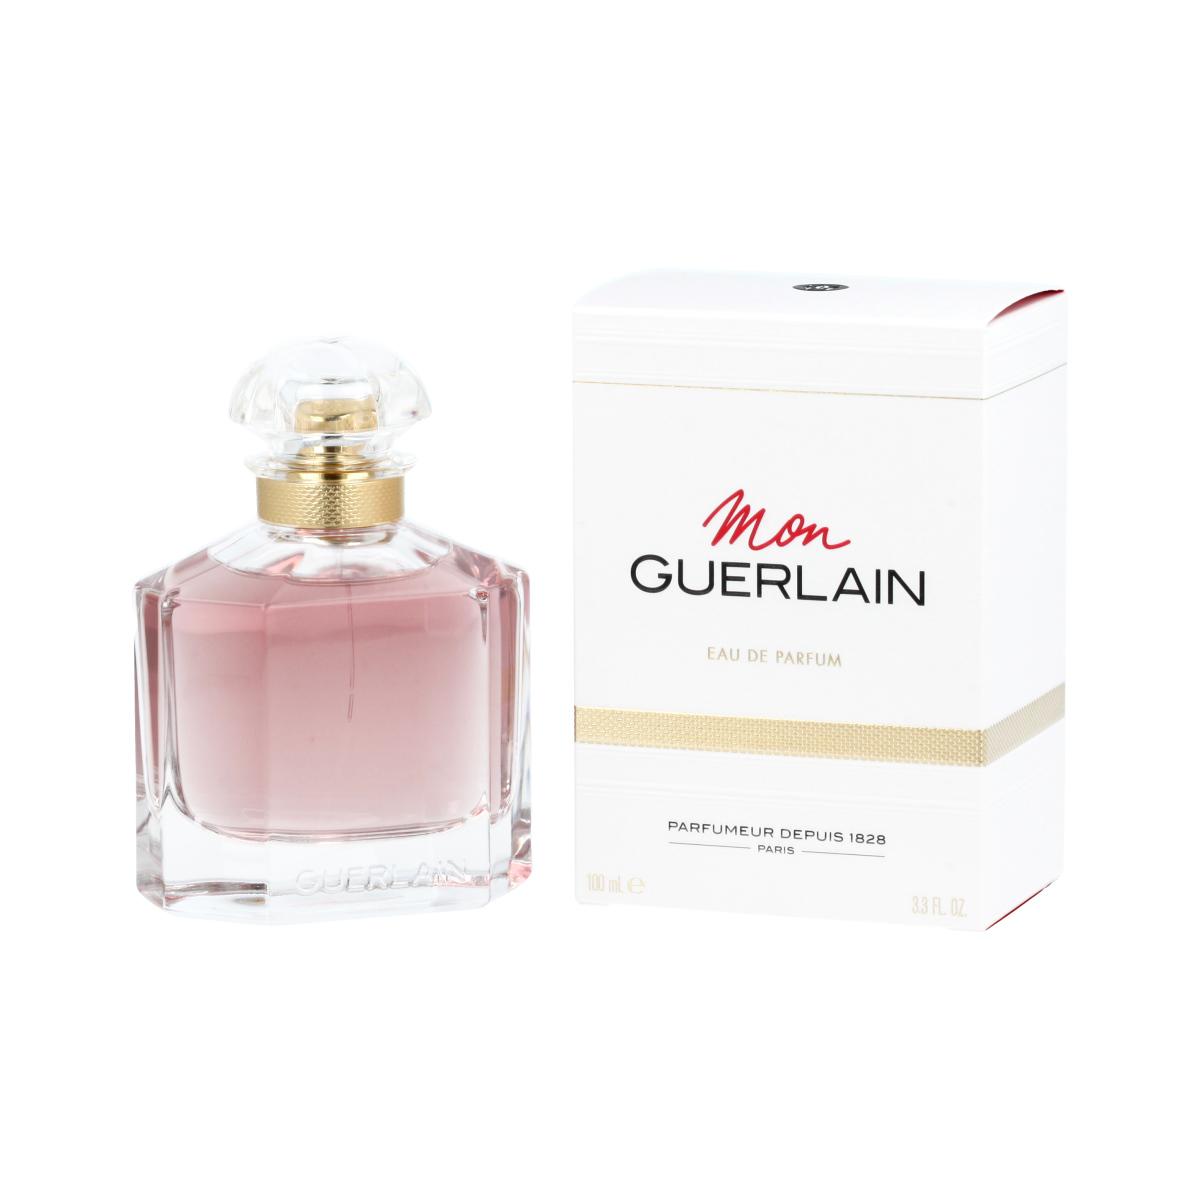 Guerlain Mon Guerlain Eau De Parfum 100 ml (woman) 91093